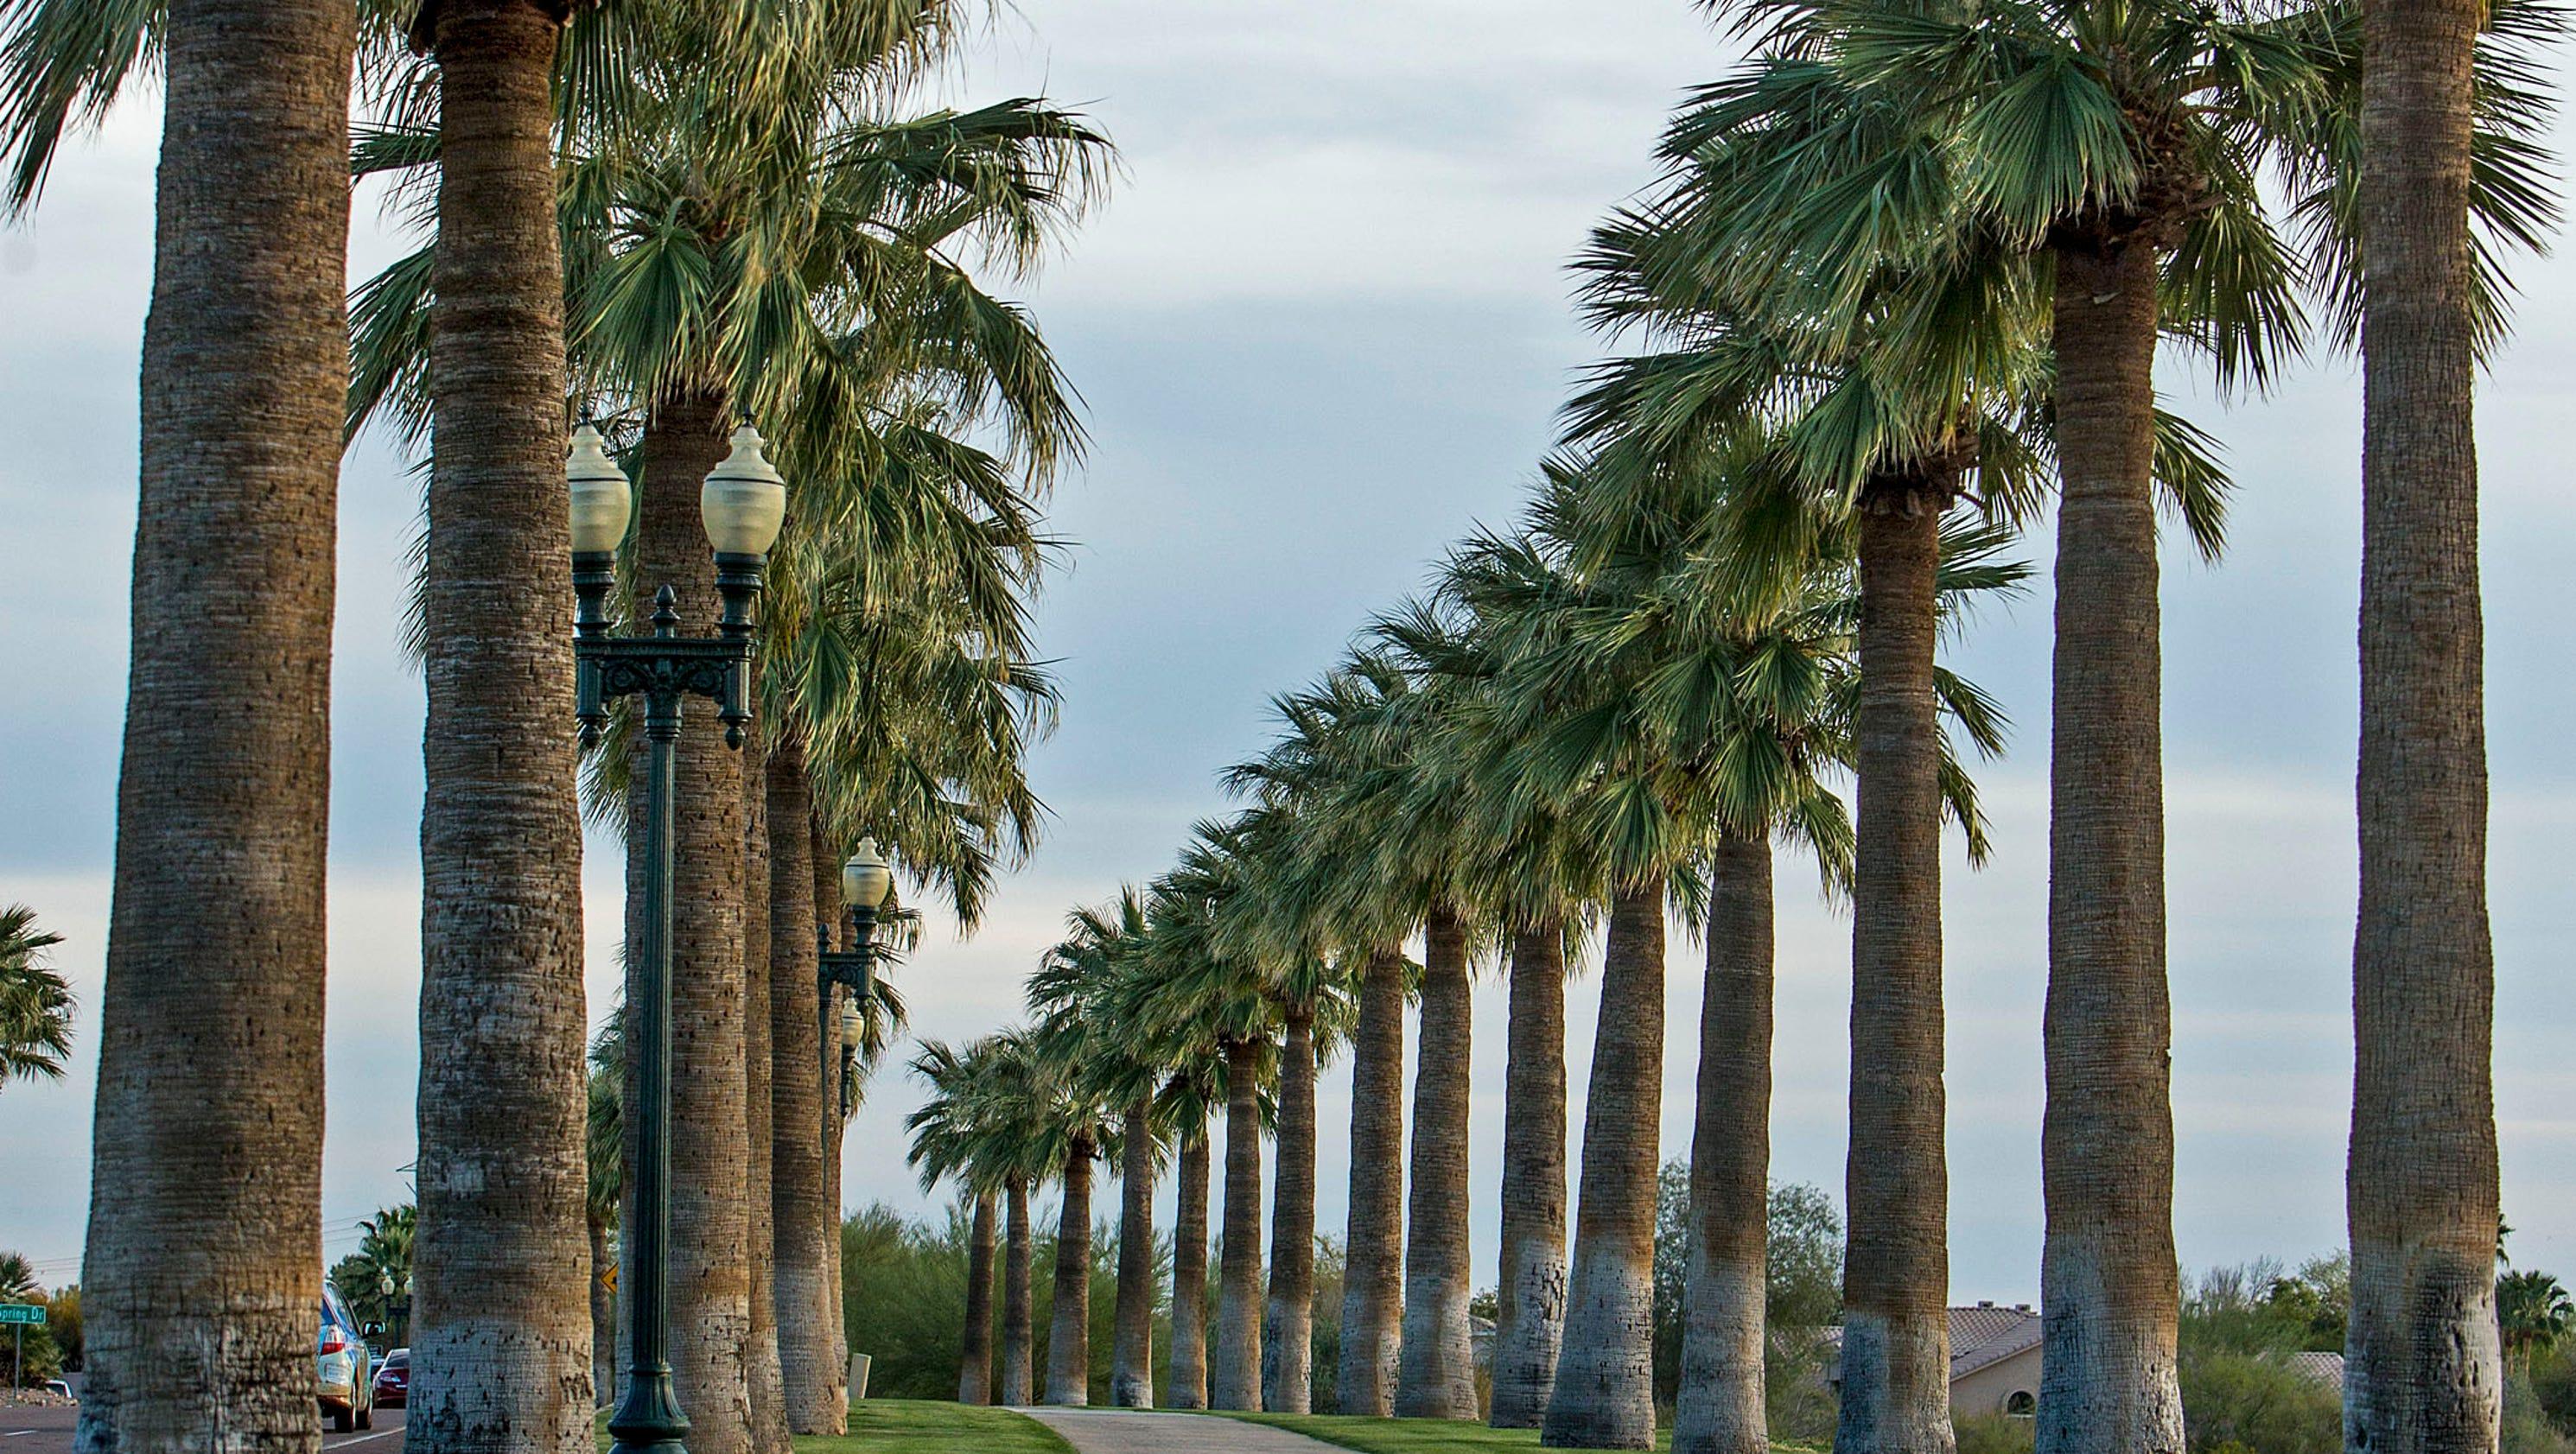 are palm trees native to arizona. Black Bedroom Furniture Sets. Home Design Ideas